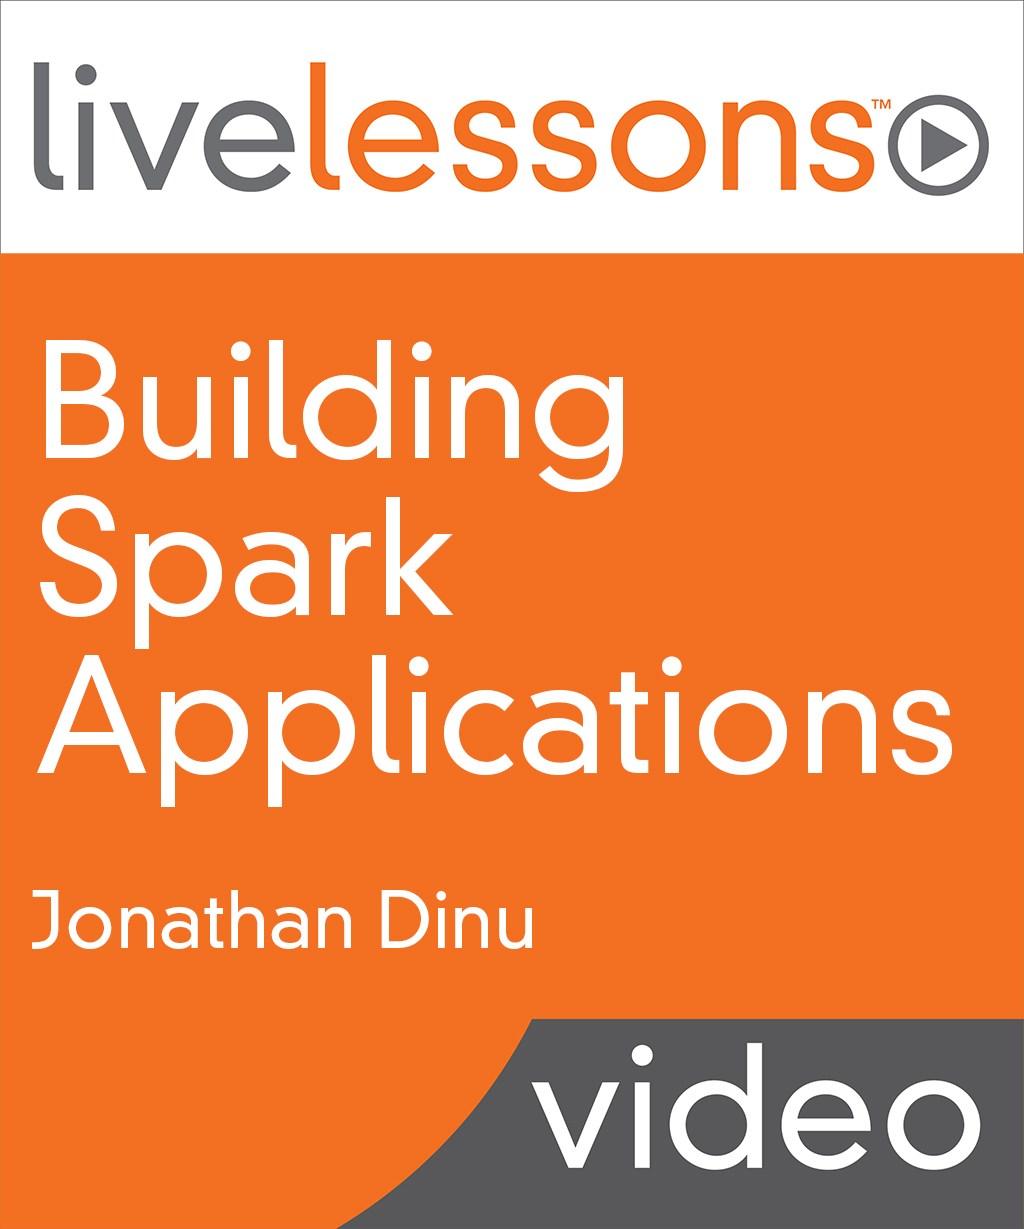 Building Spark Applications LiveLessons